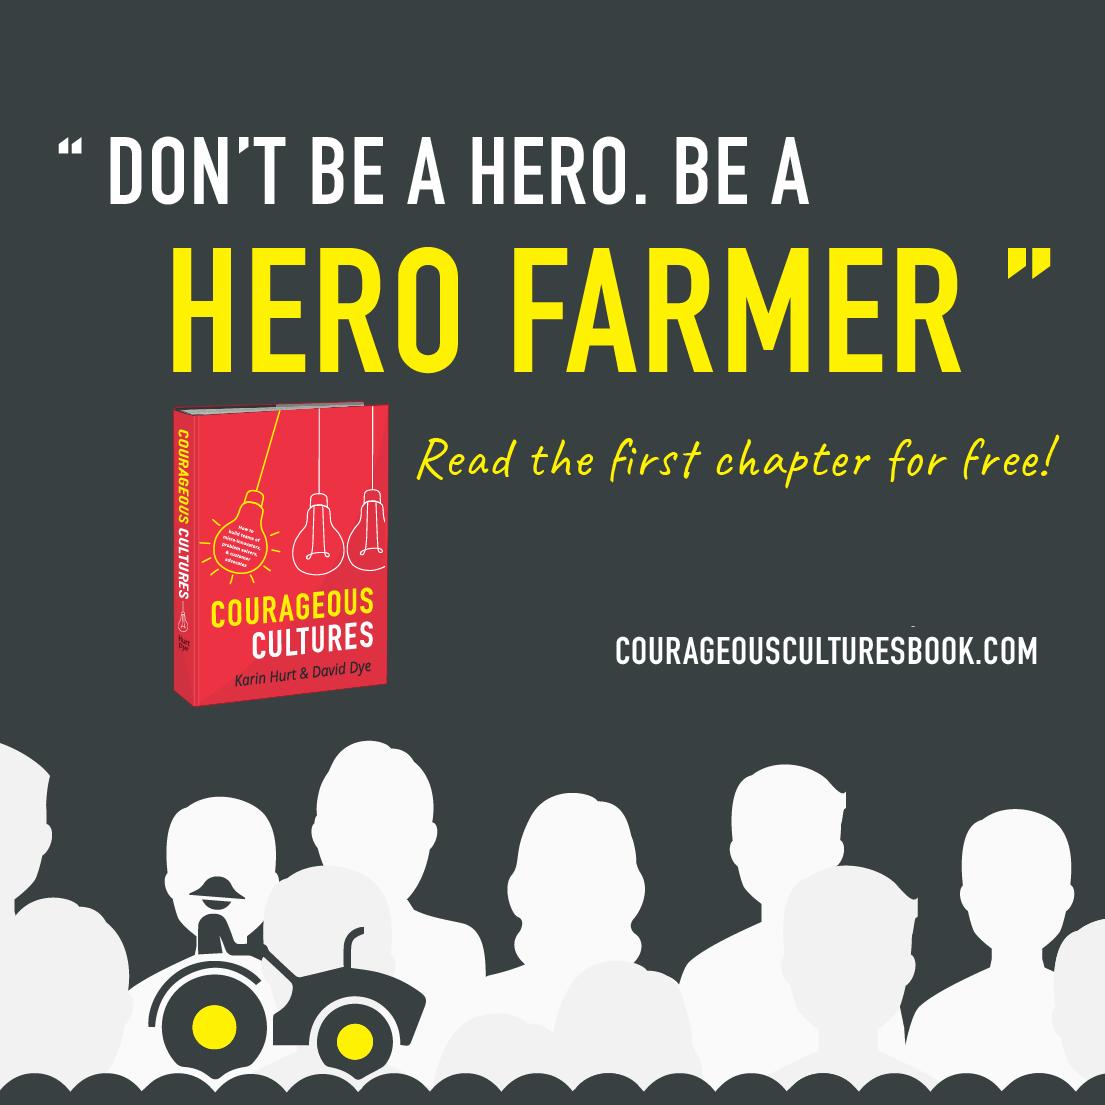 Be a Hero Farmer